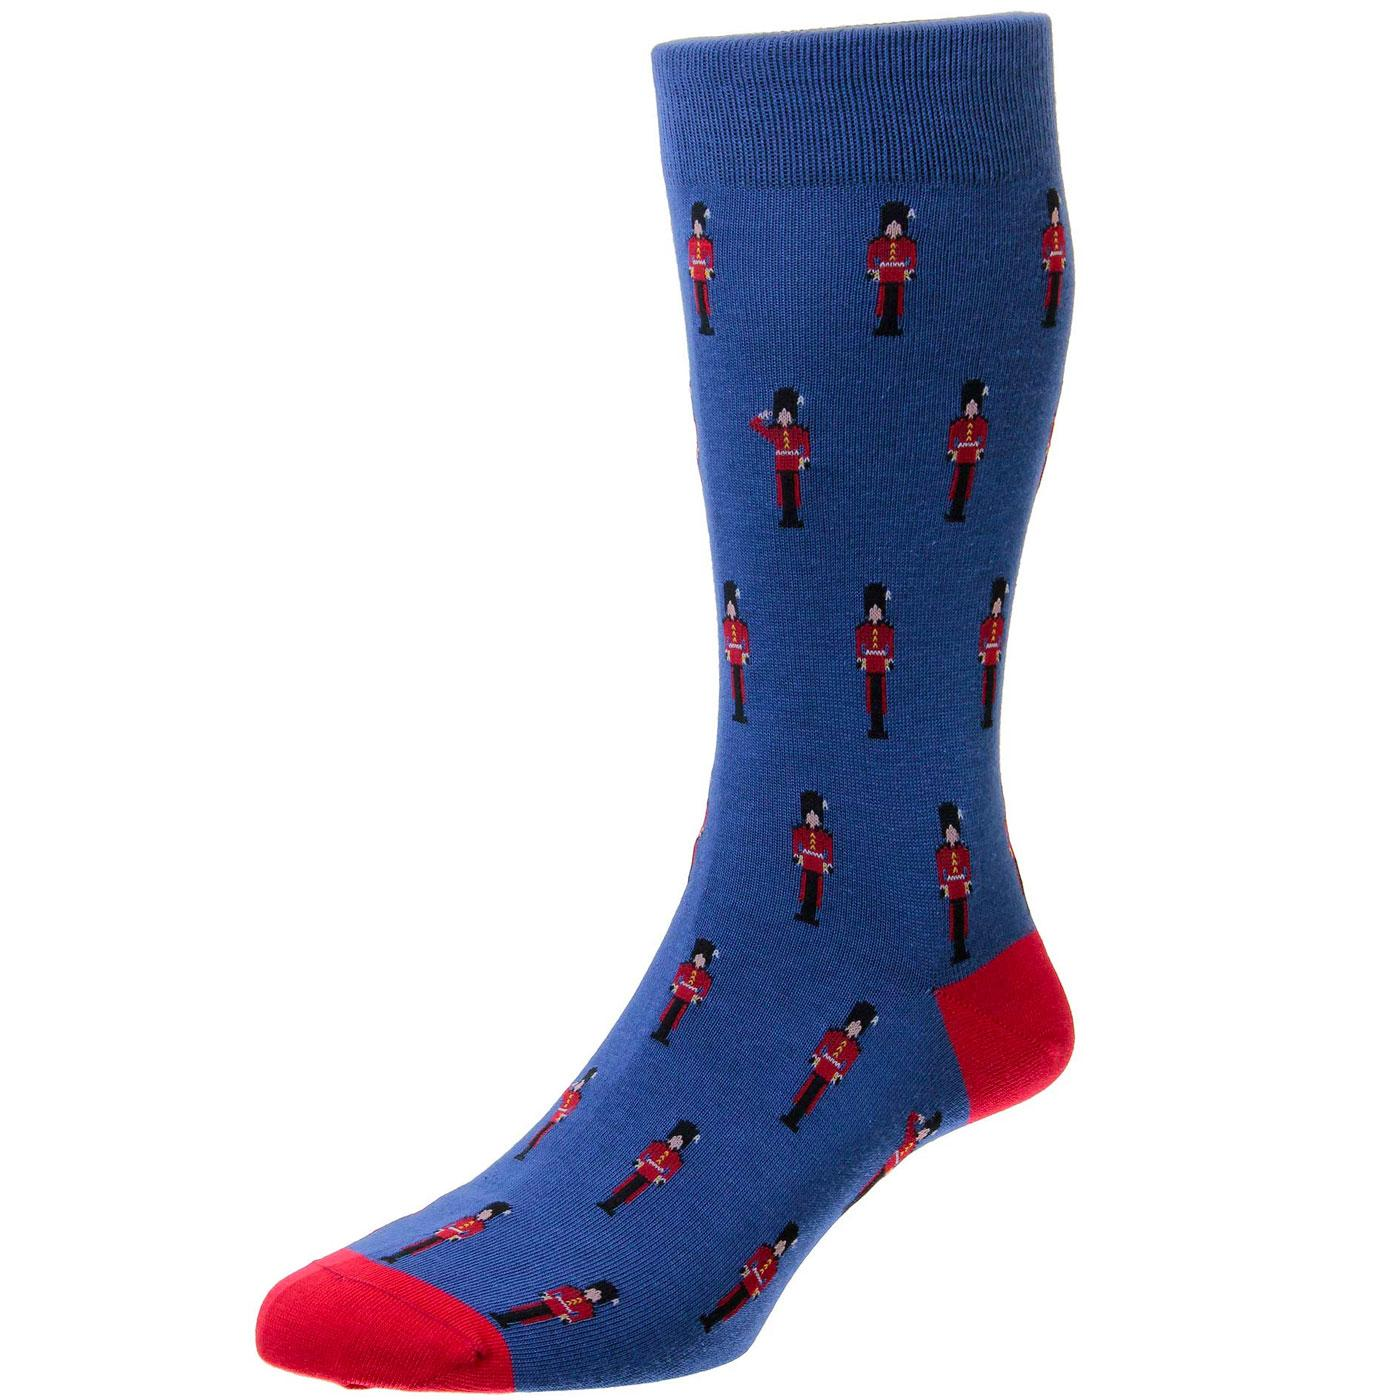 + St James SCOTT-NICHOL Retro Queens Guards Socks